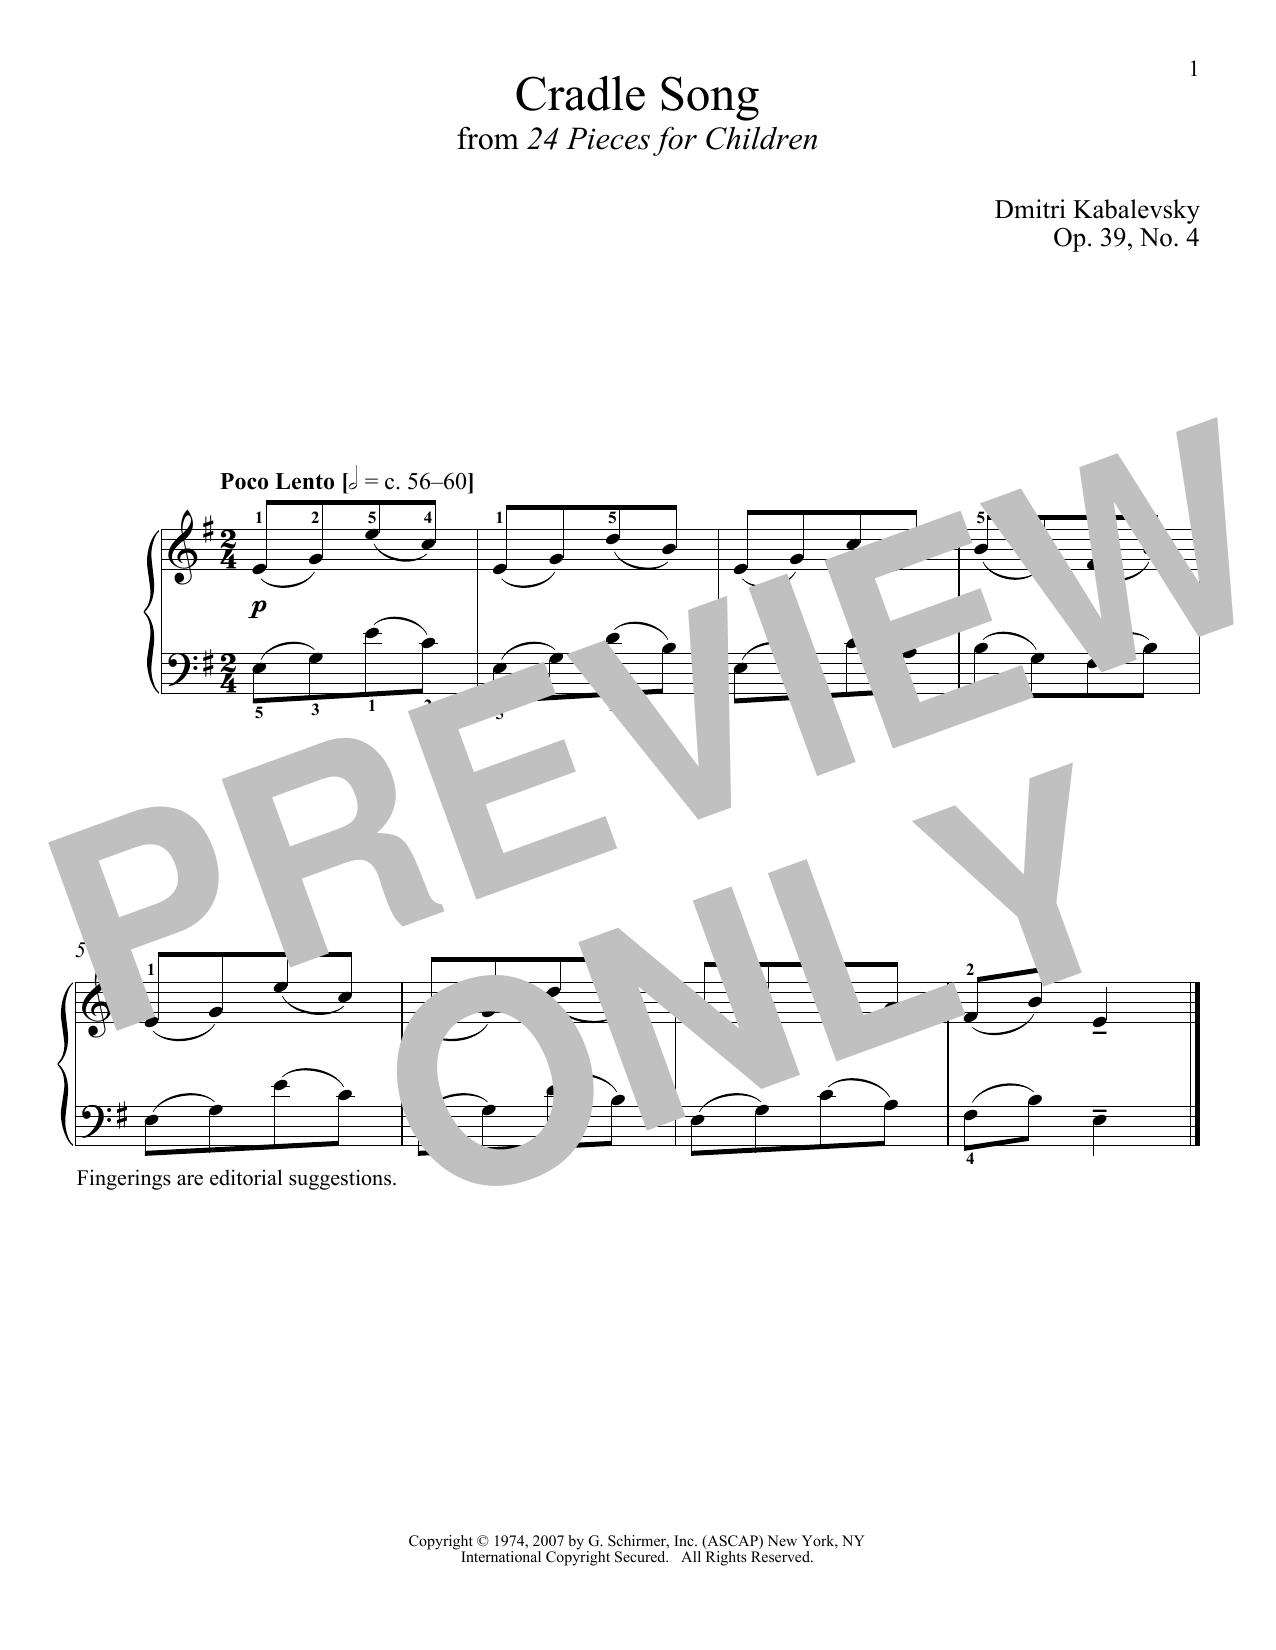 Dmitri Kabalevsky Cradle Song, Op. 39, No. 4 sheet music notes and chords. Download Printable PDF.